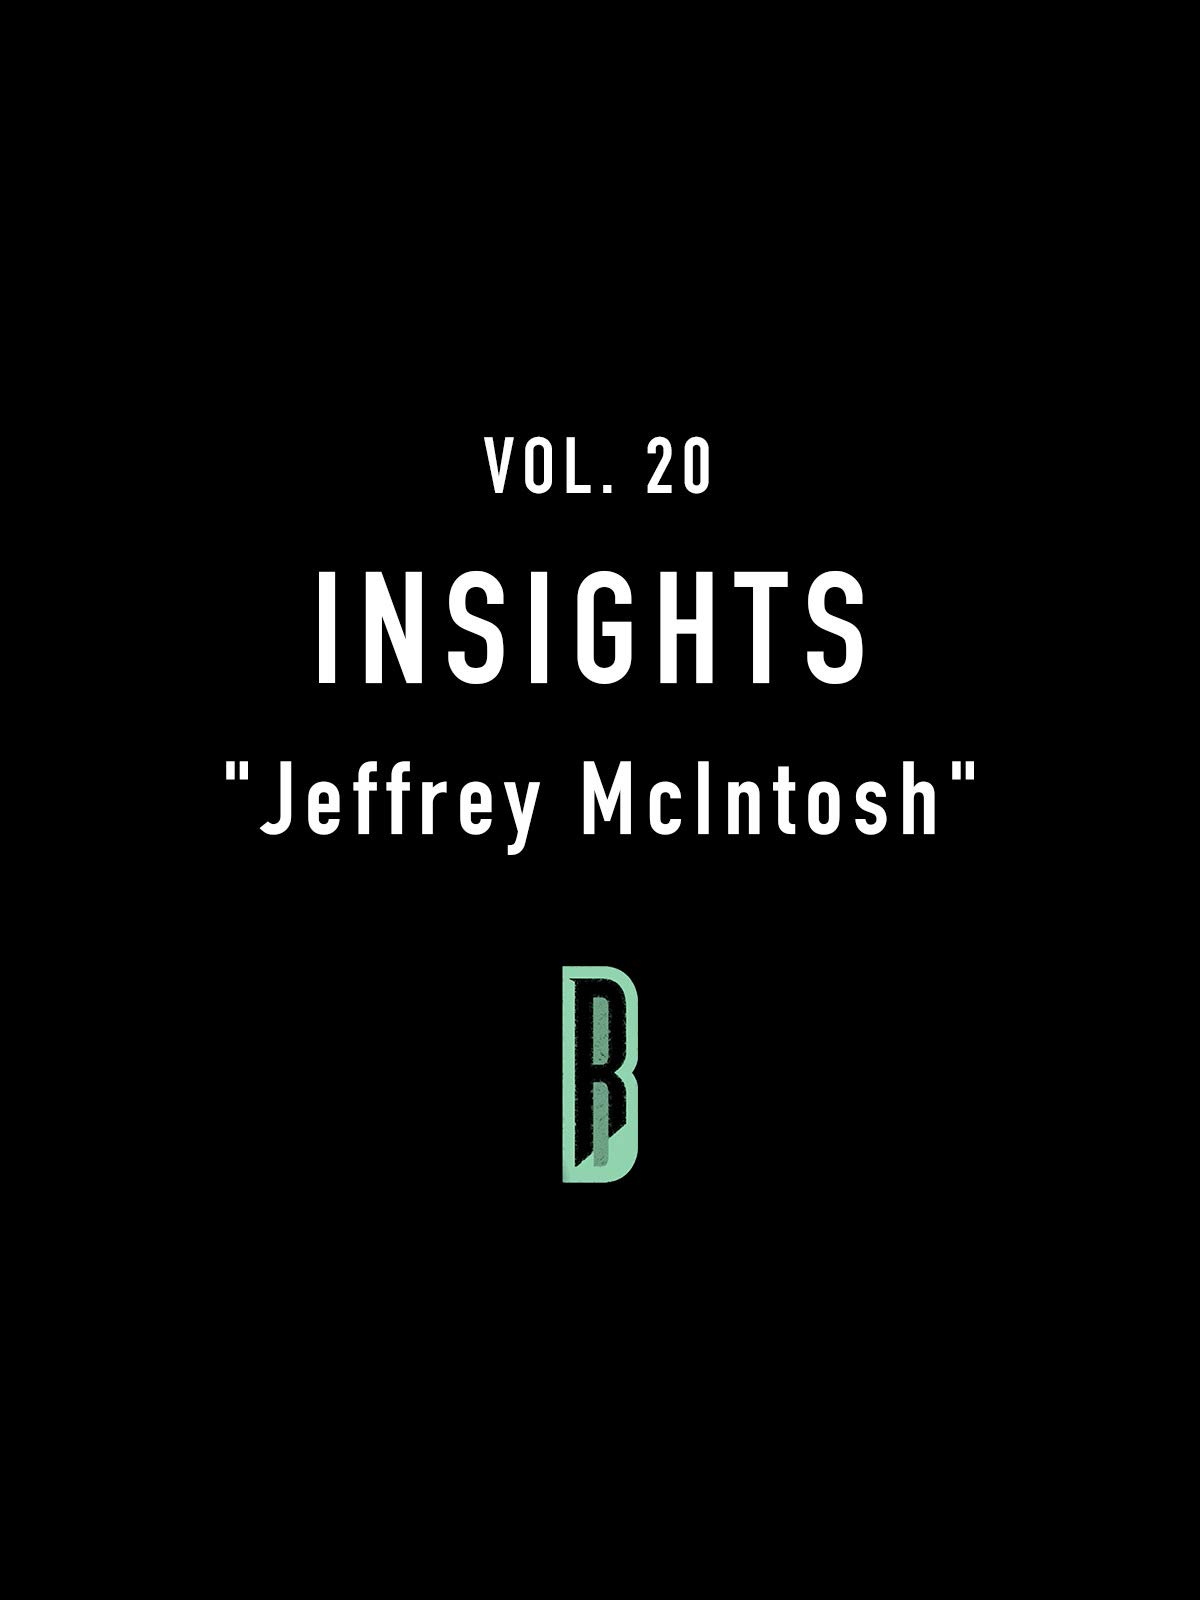 Insights Vol. 20